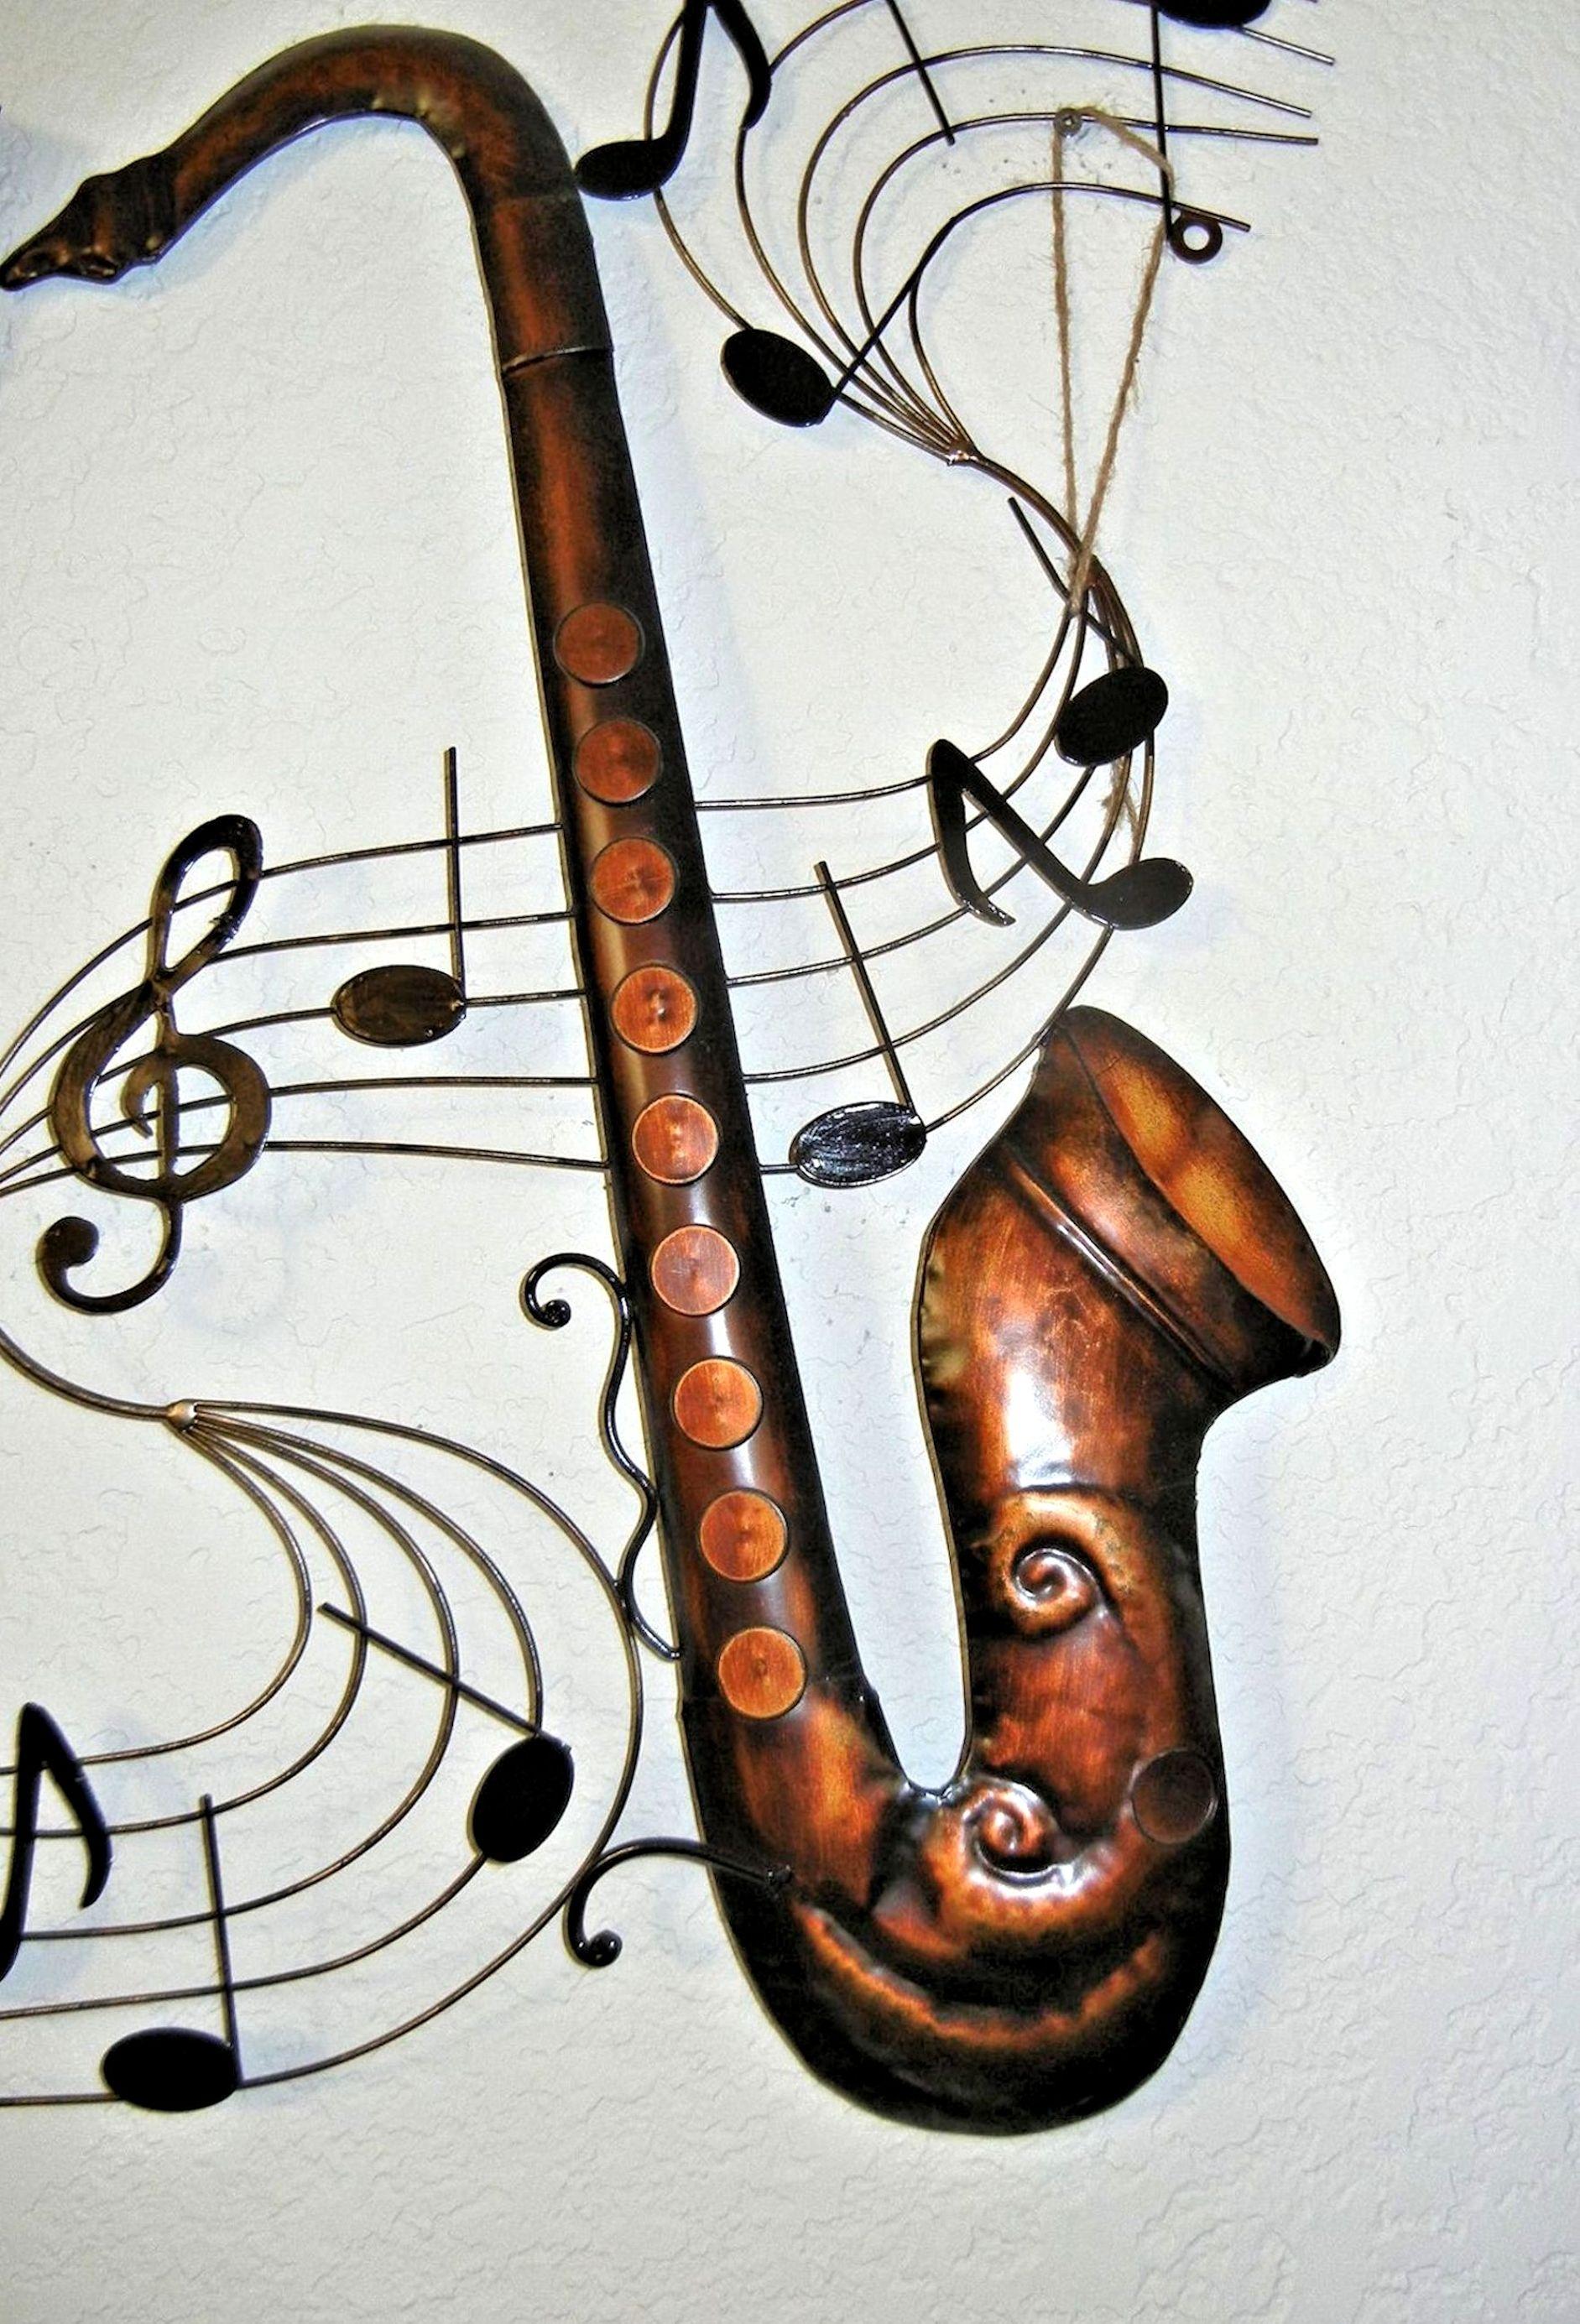 Gambar Gitar Jumlah Alat Musik Fon Saksofon Sketsa